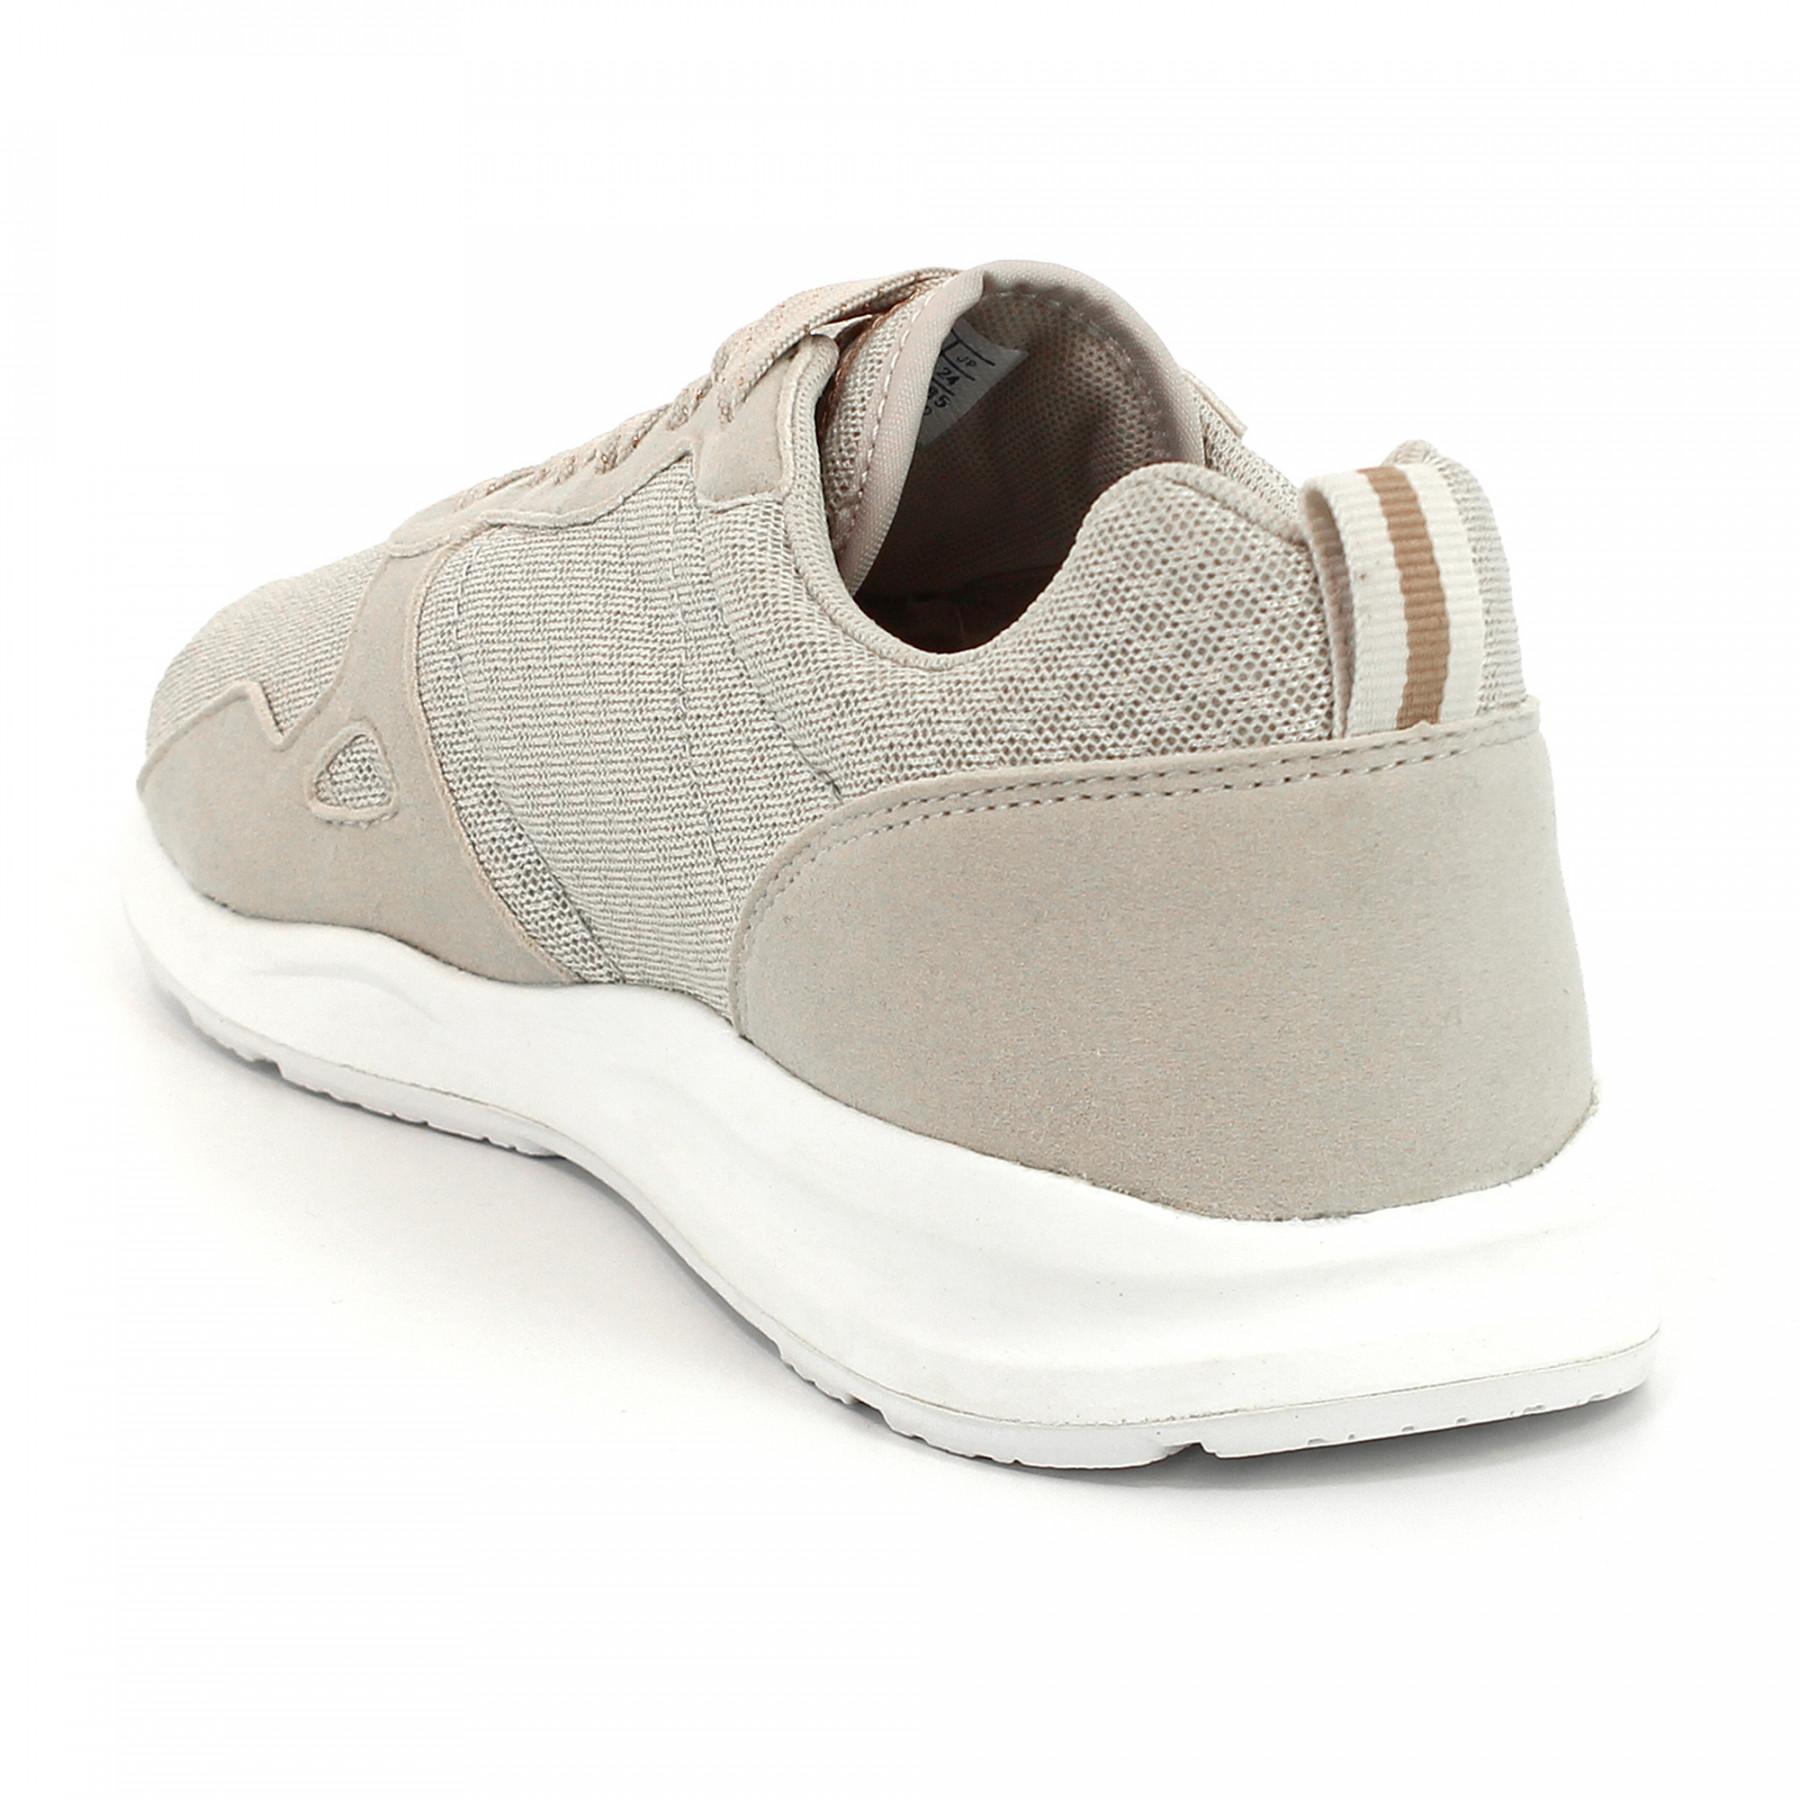 623f7f56134 Chaussures LCS R600 Feminine Mesh Gray Morn W Le Coq Sportif En ...